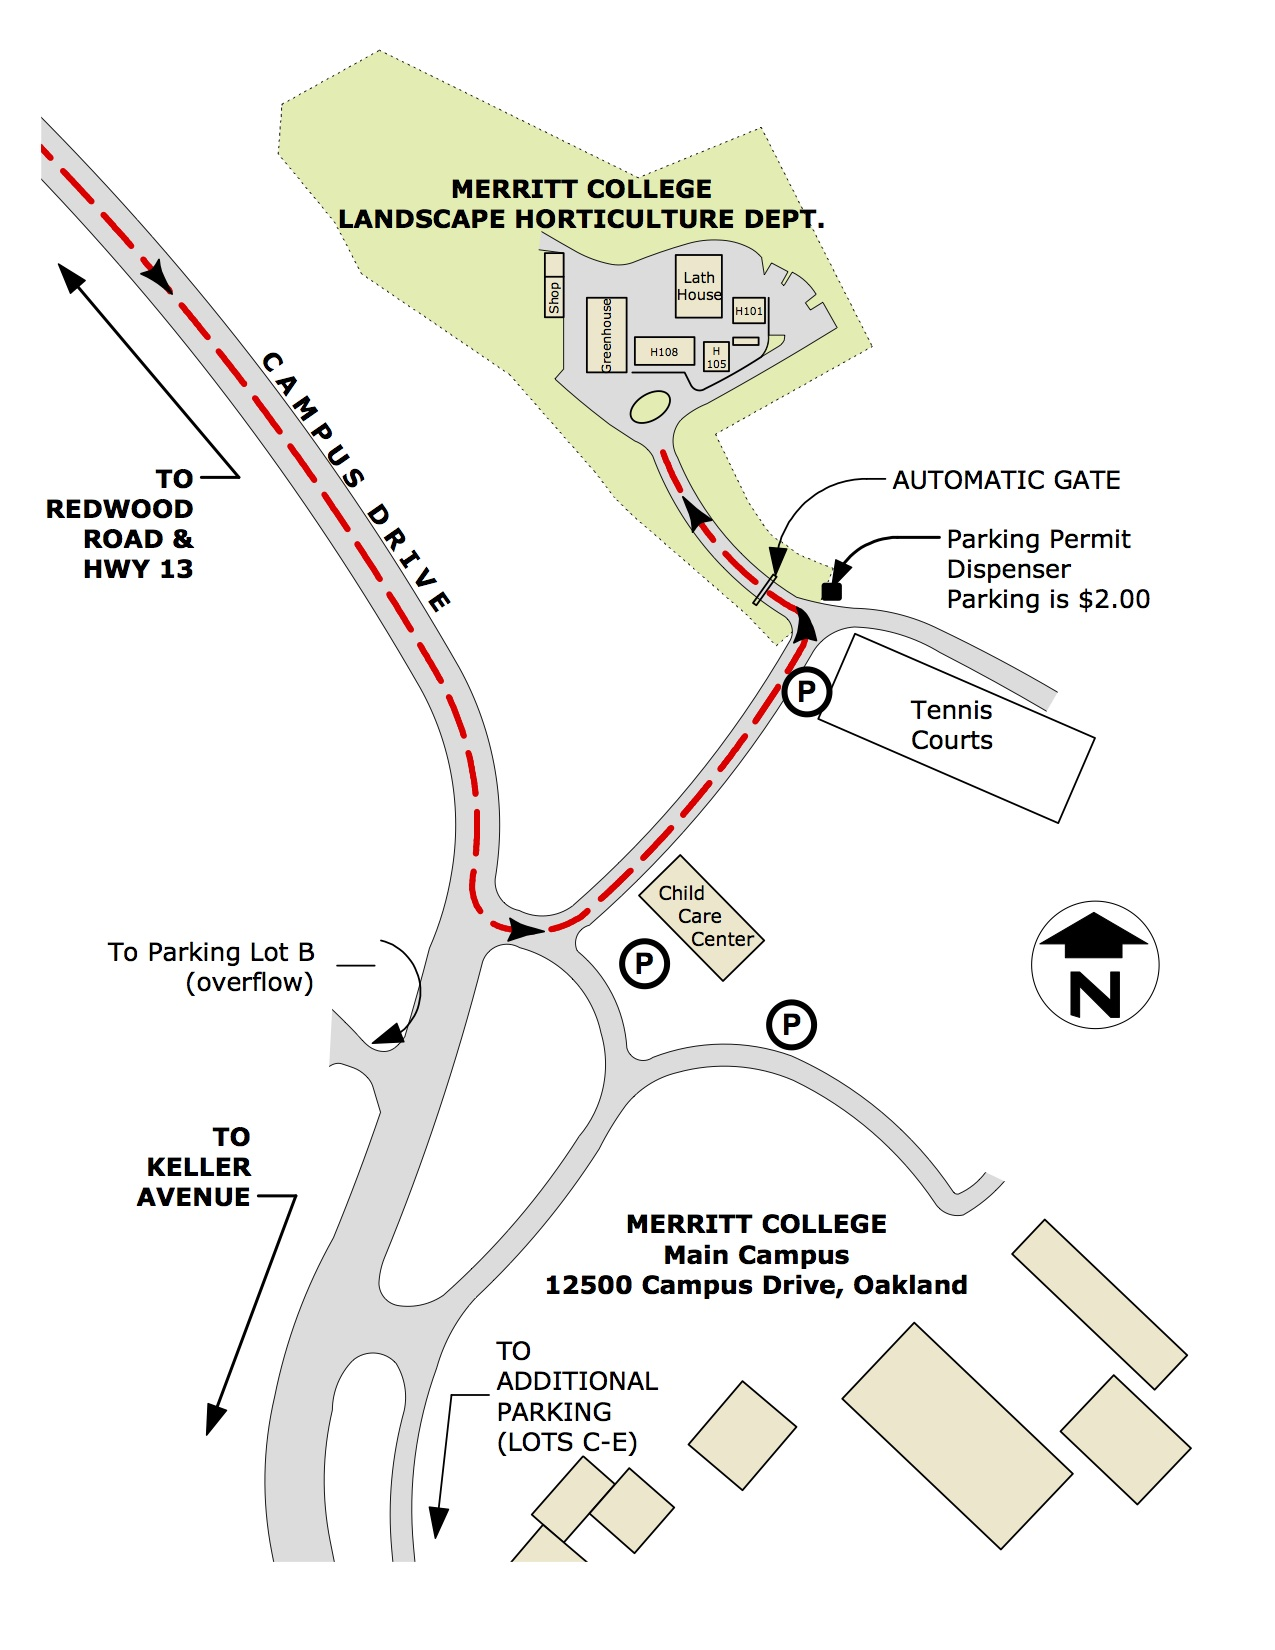 Merritt Land Hort Map 201206